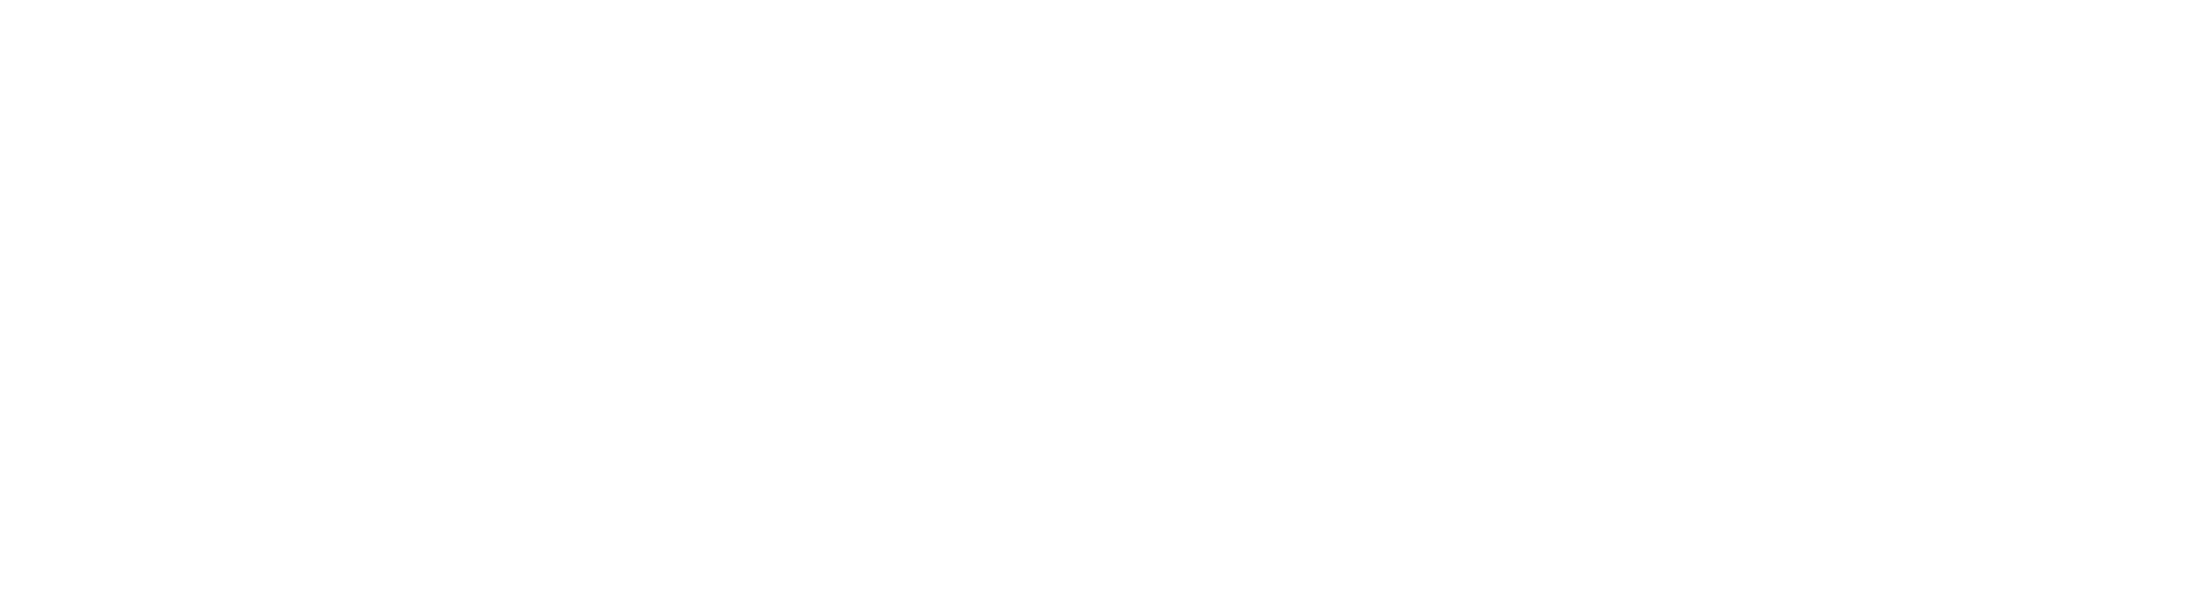 RESAFE-MARKETING-B-logo-Marca-Registrada